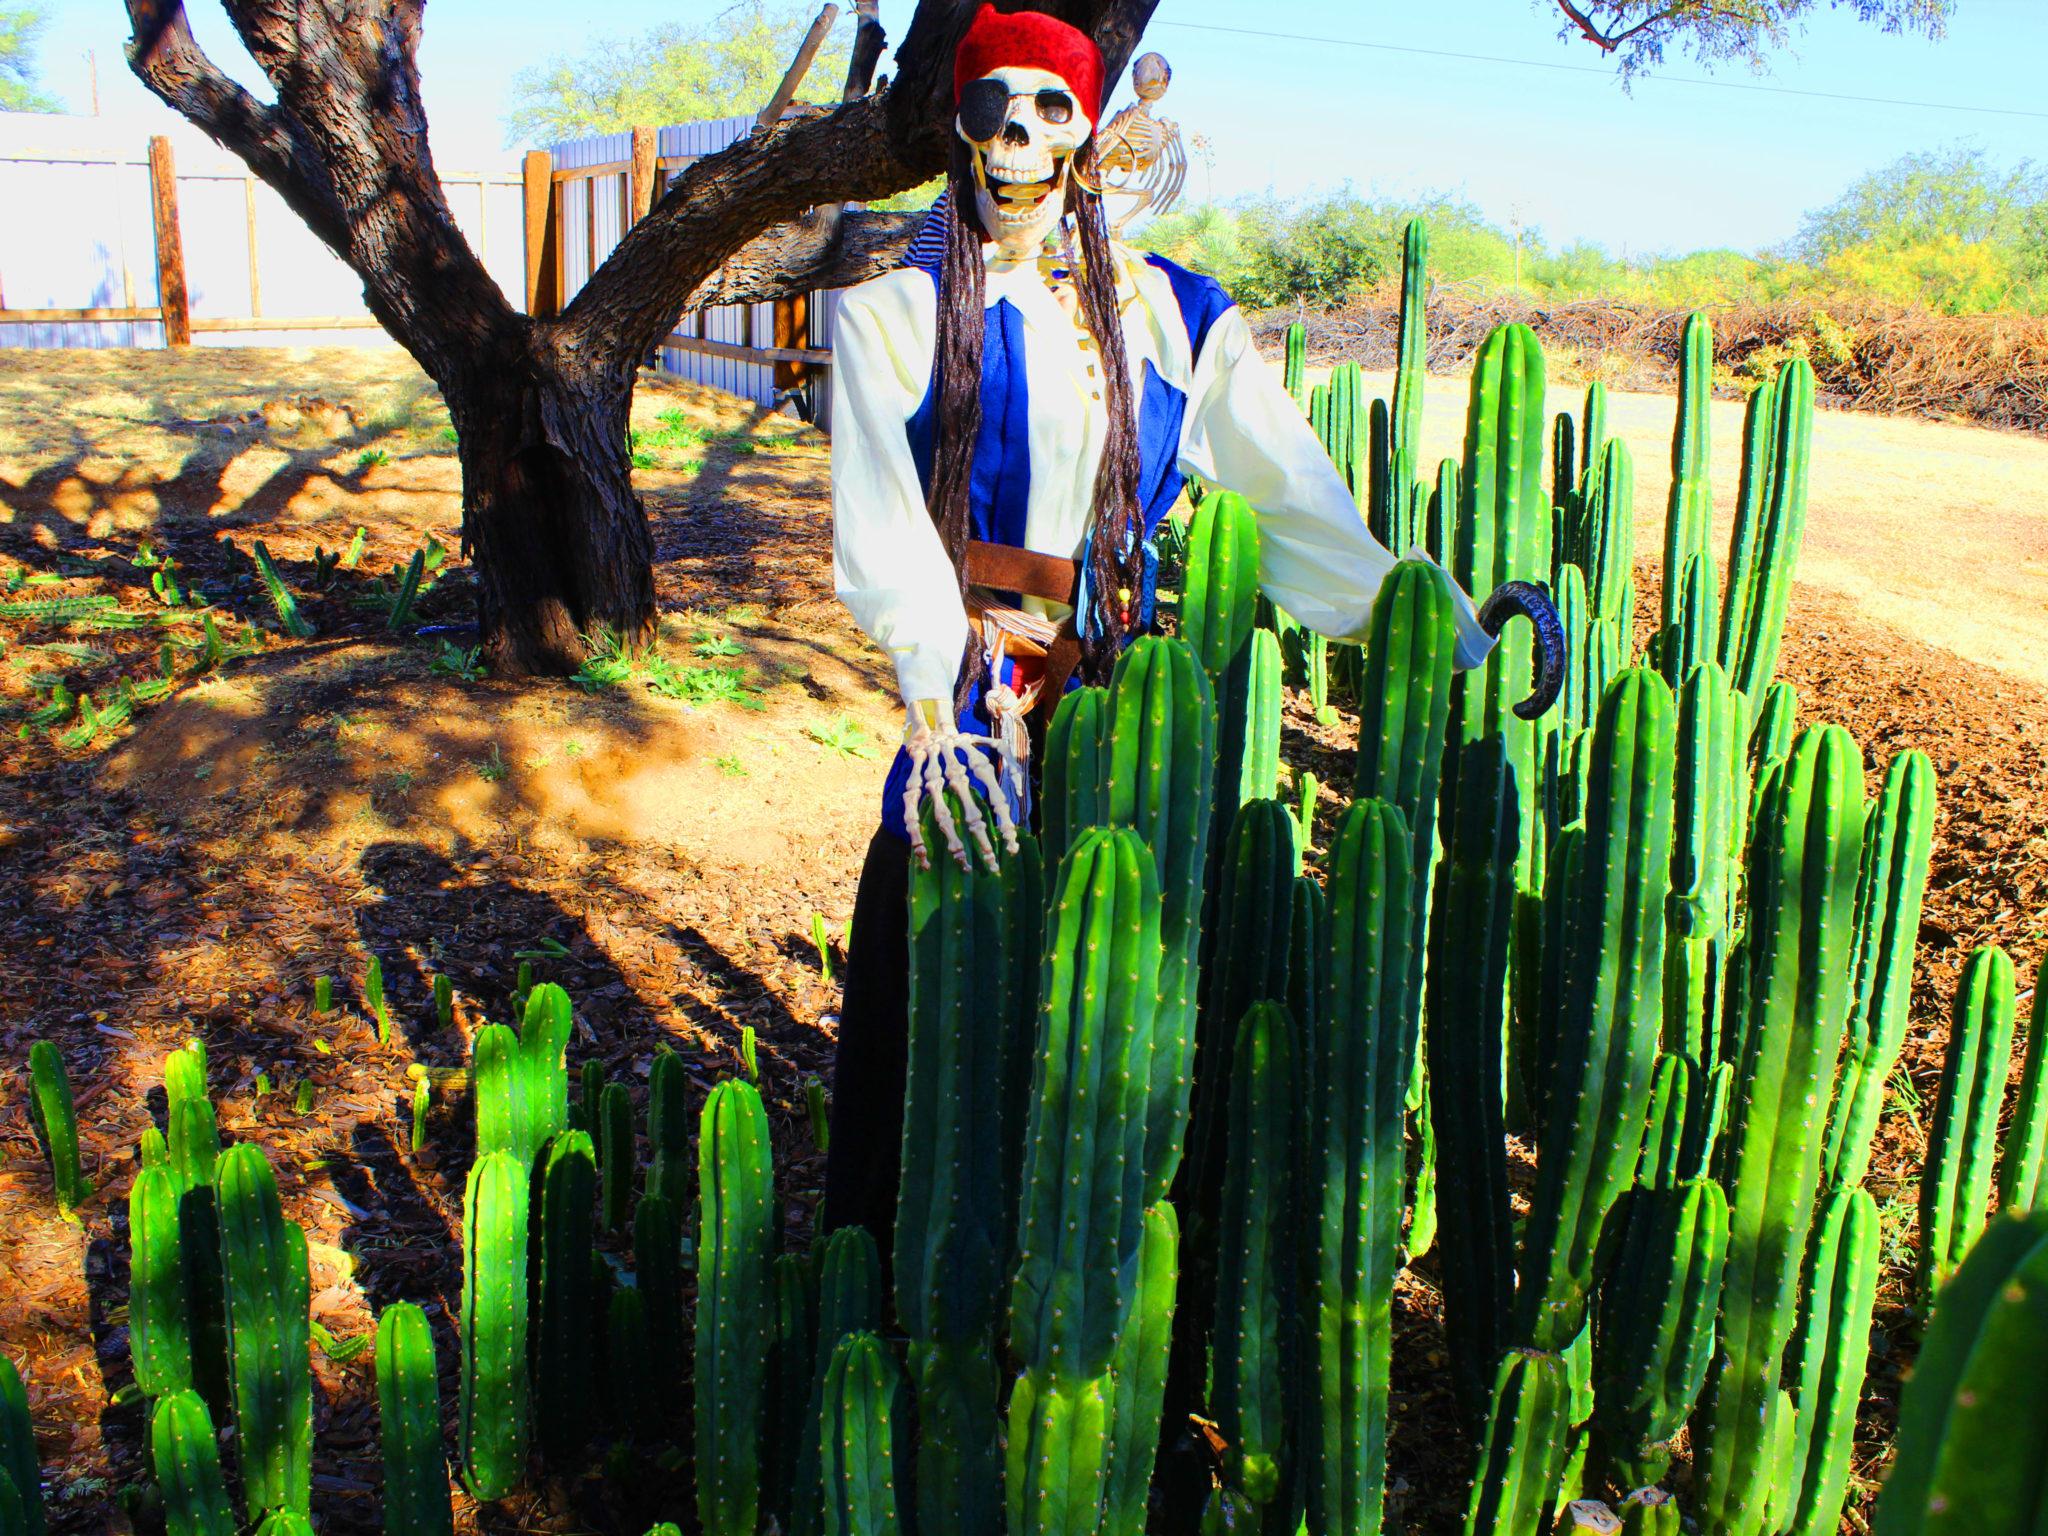 Cactus Jack, San Pedro Cacti, Trichocereus Pachanoi, Peruvian cacti, sale, buy